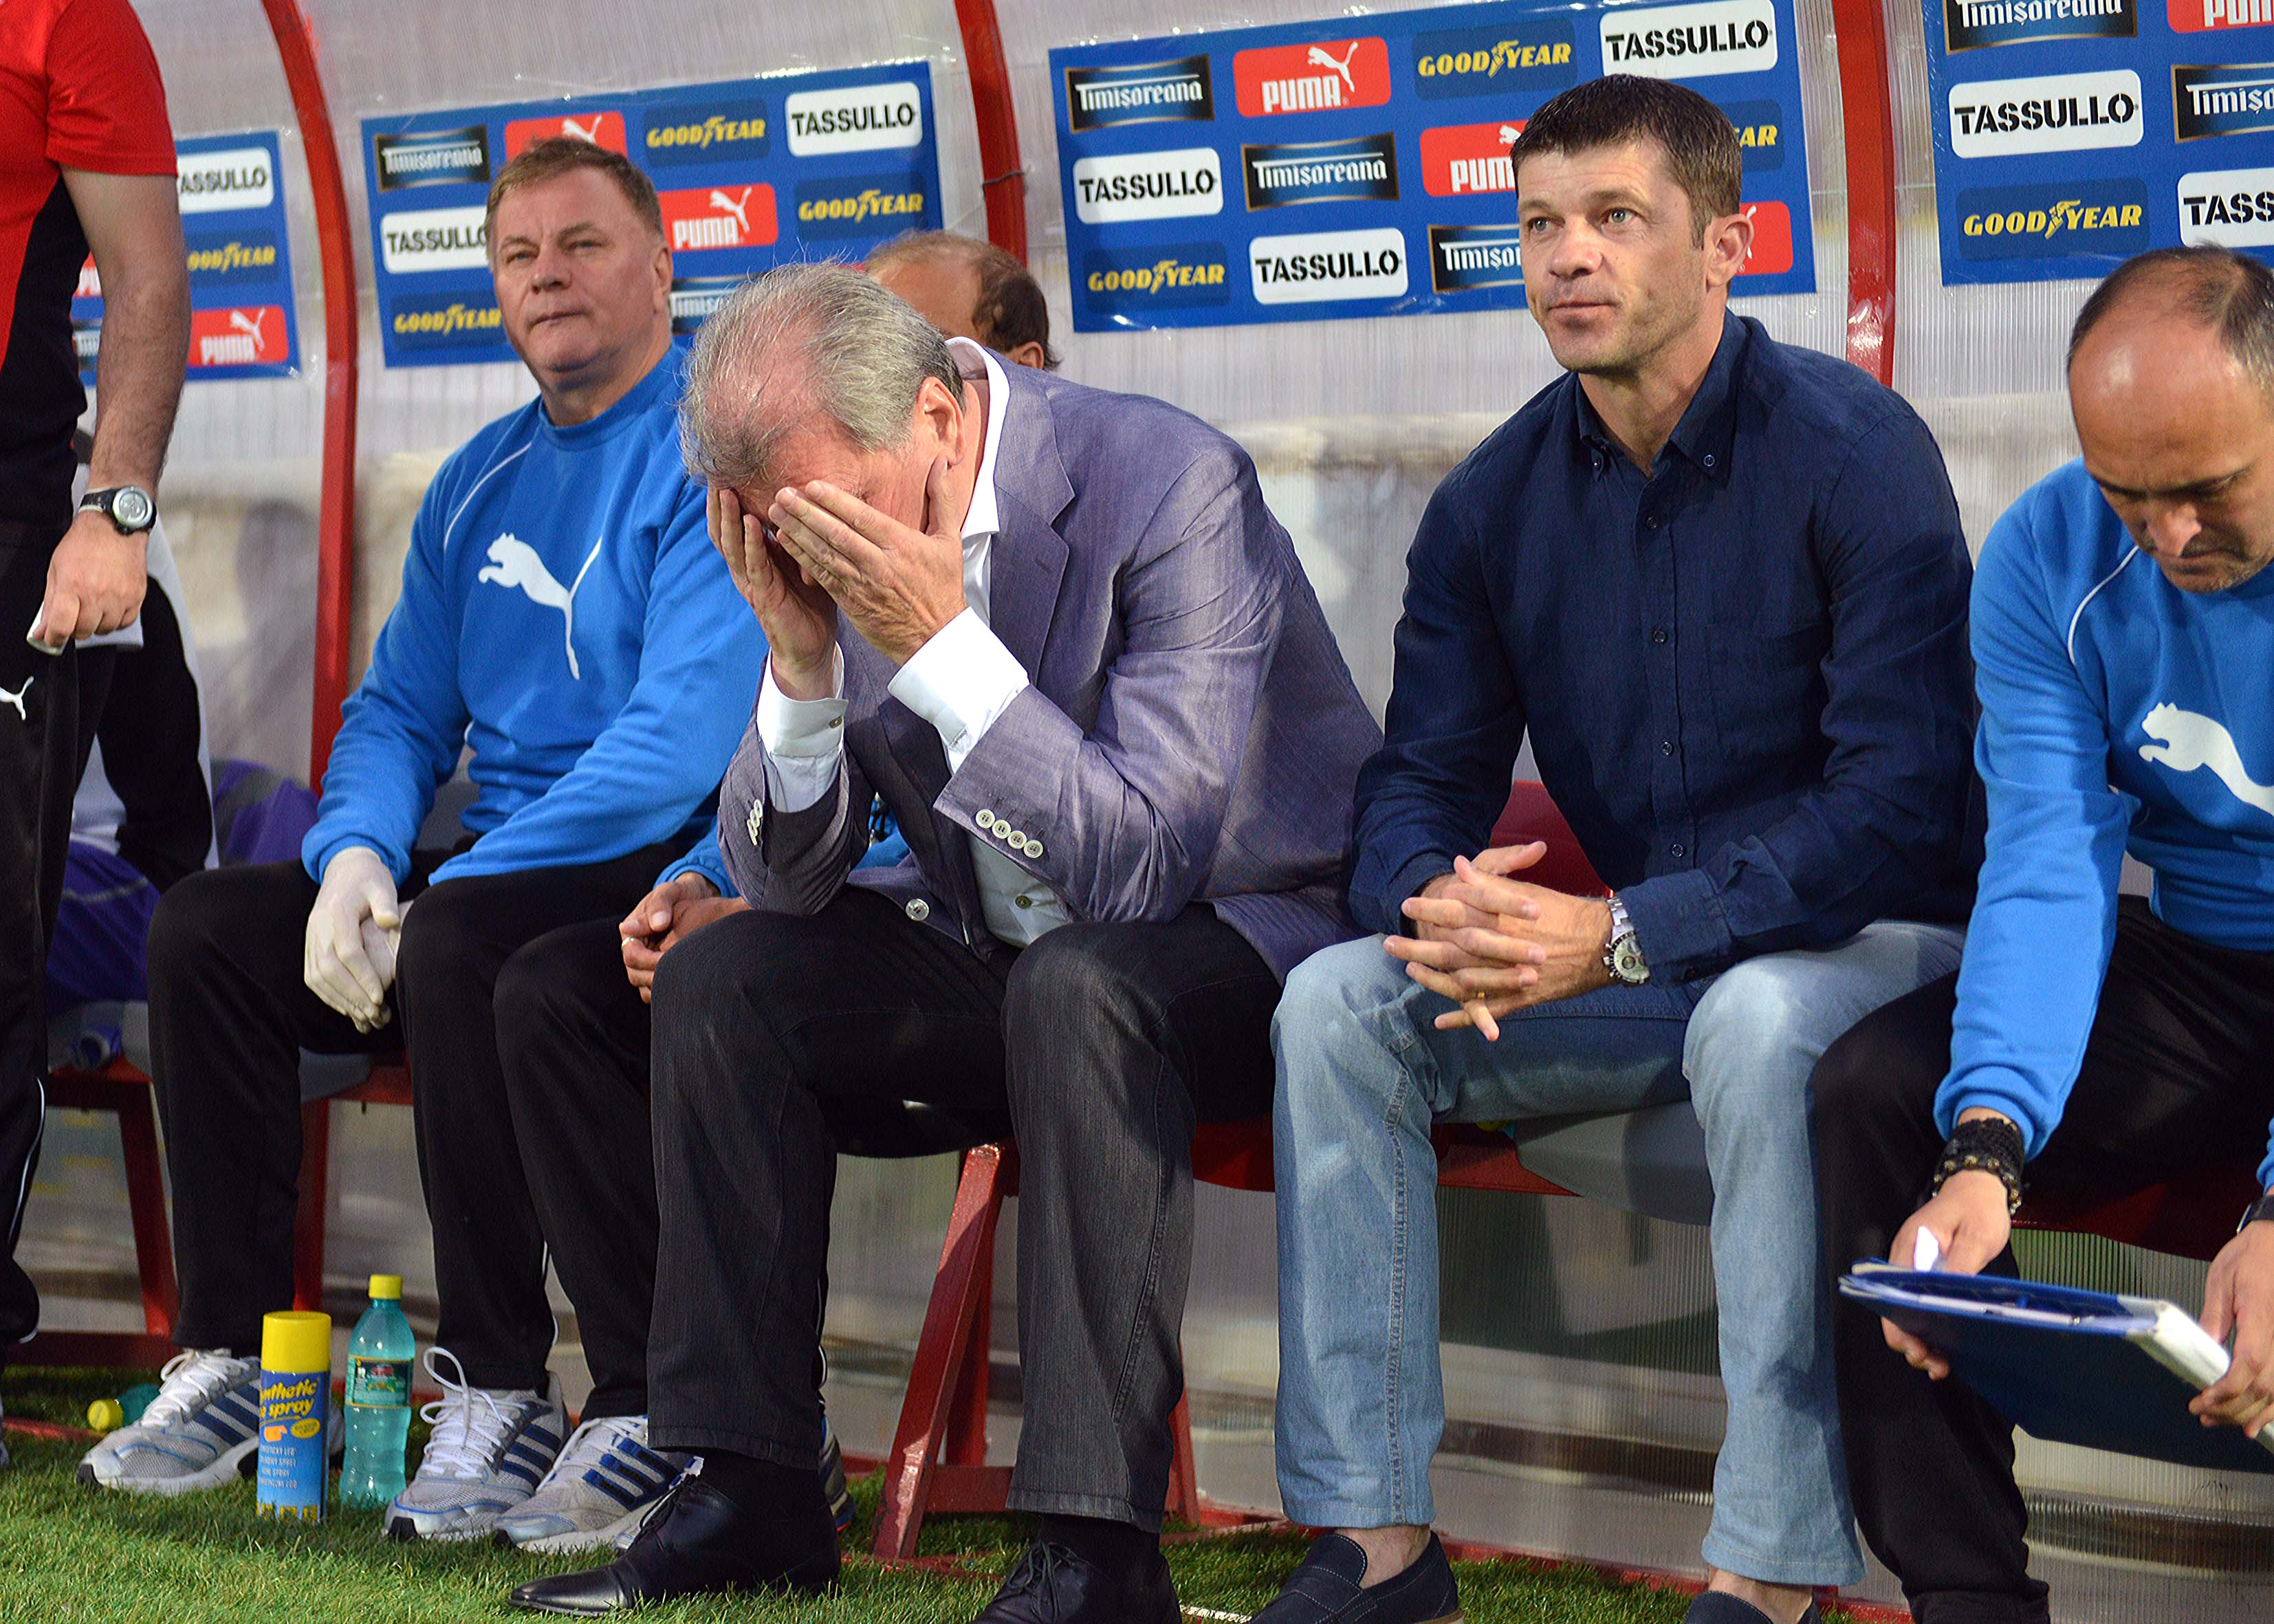 FOTBAL:ASTRA GIURGIU-CFR 1907 CLUJ NAPOCA 0-1,CUPA ROMANIEI TIMISOREANA (22.05.2013)